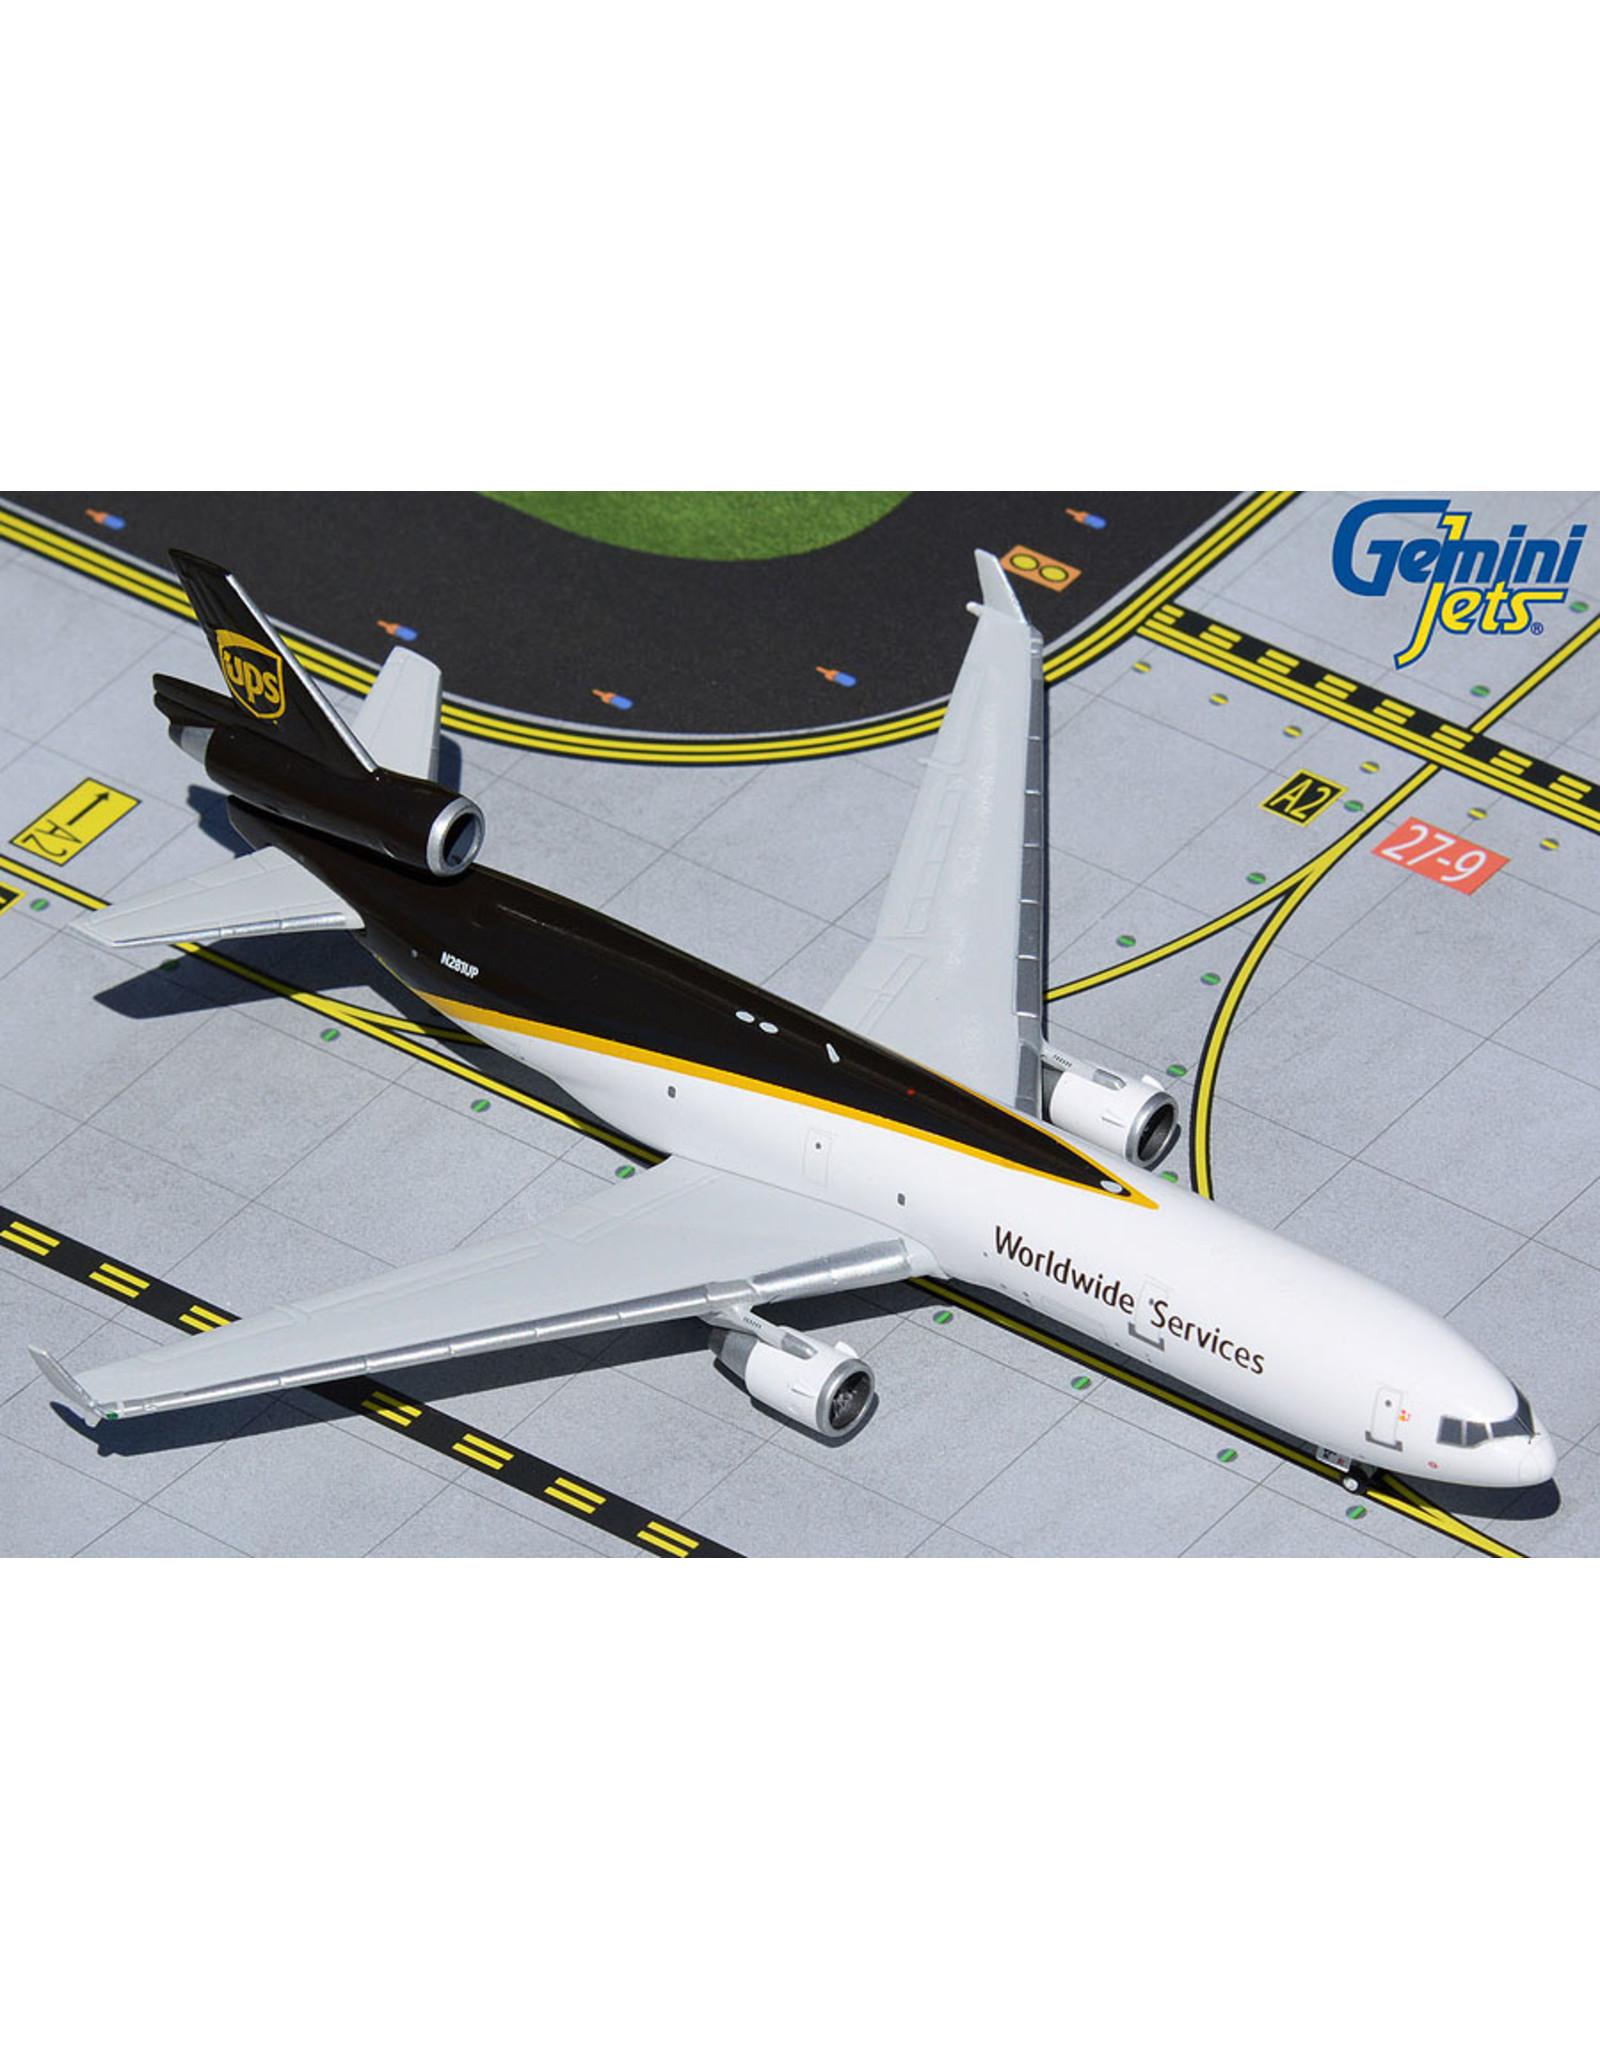 Gemini Gem4 UPS MD-11F N281UP